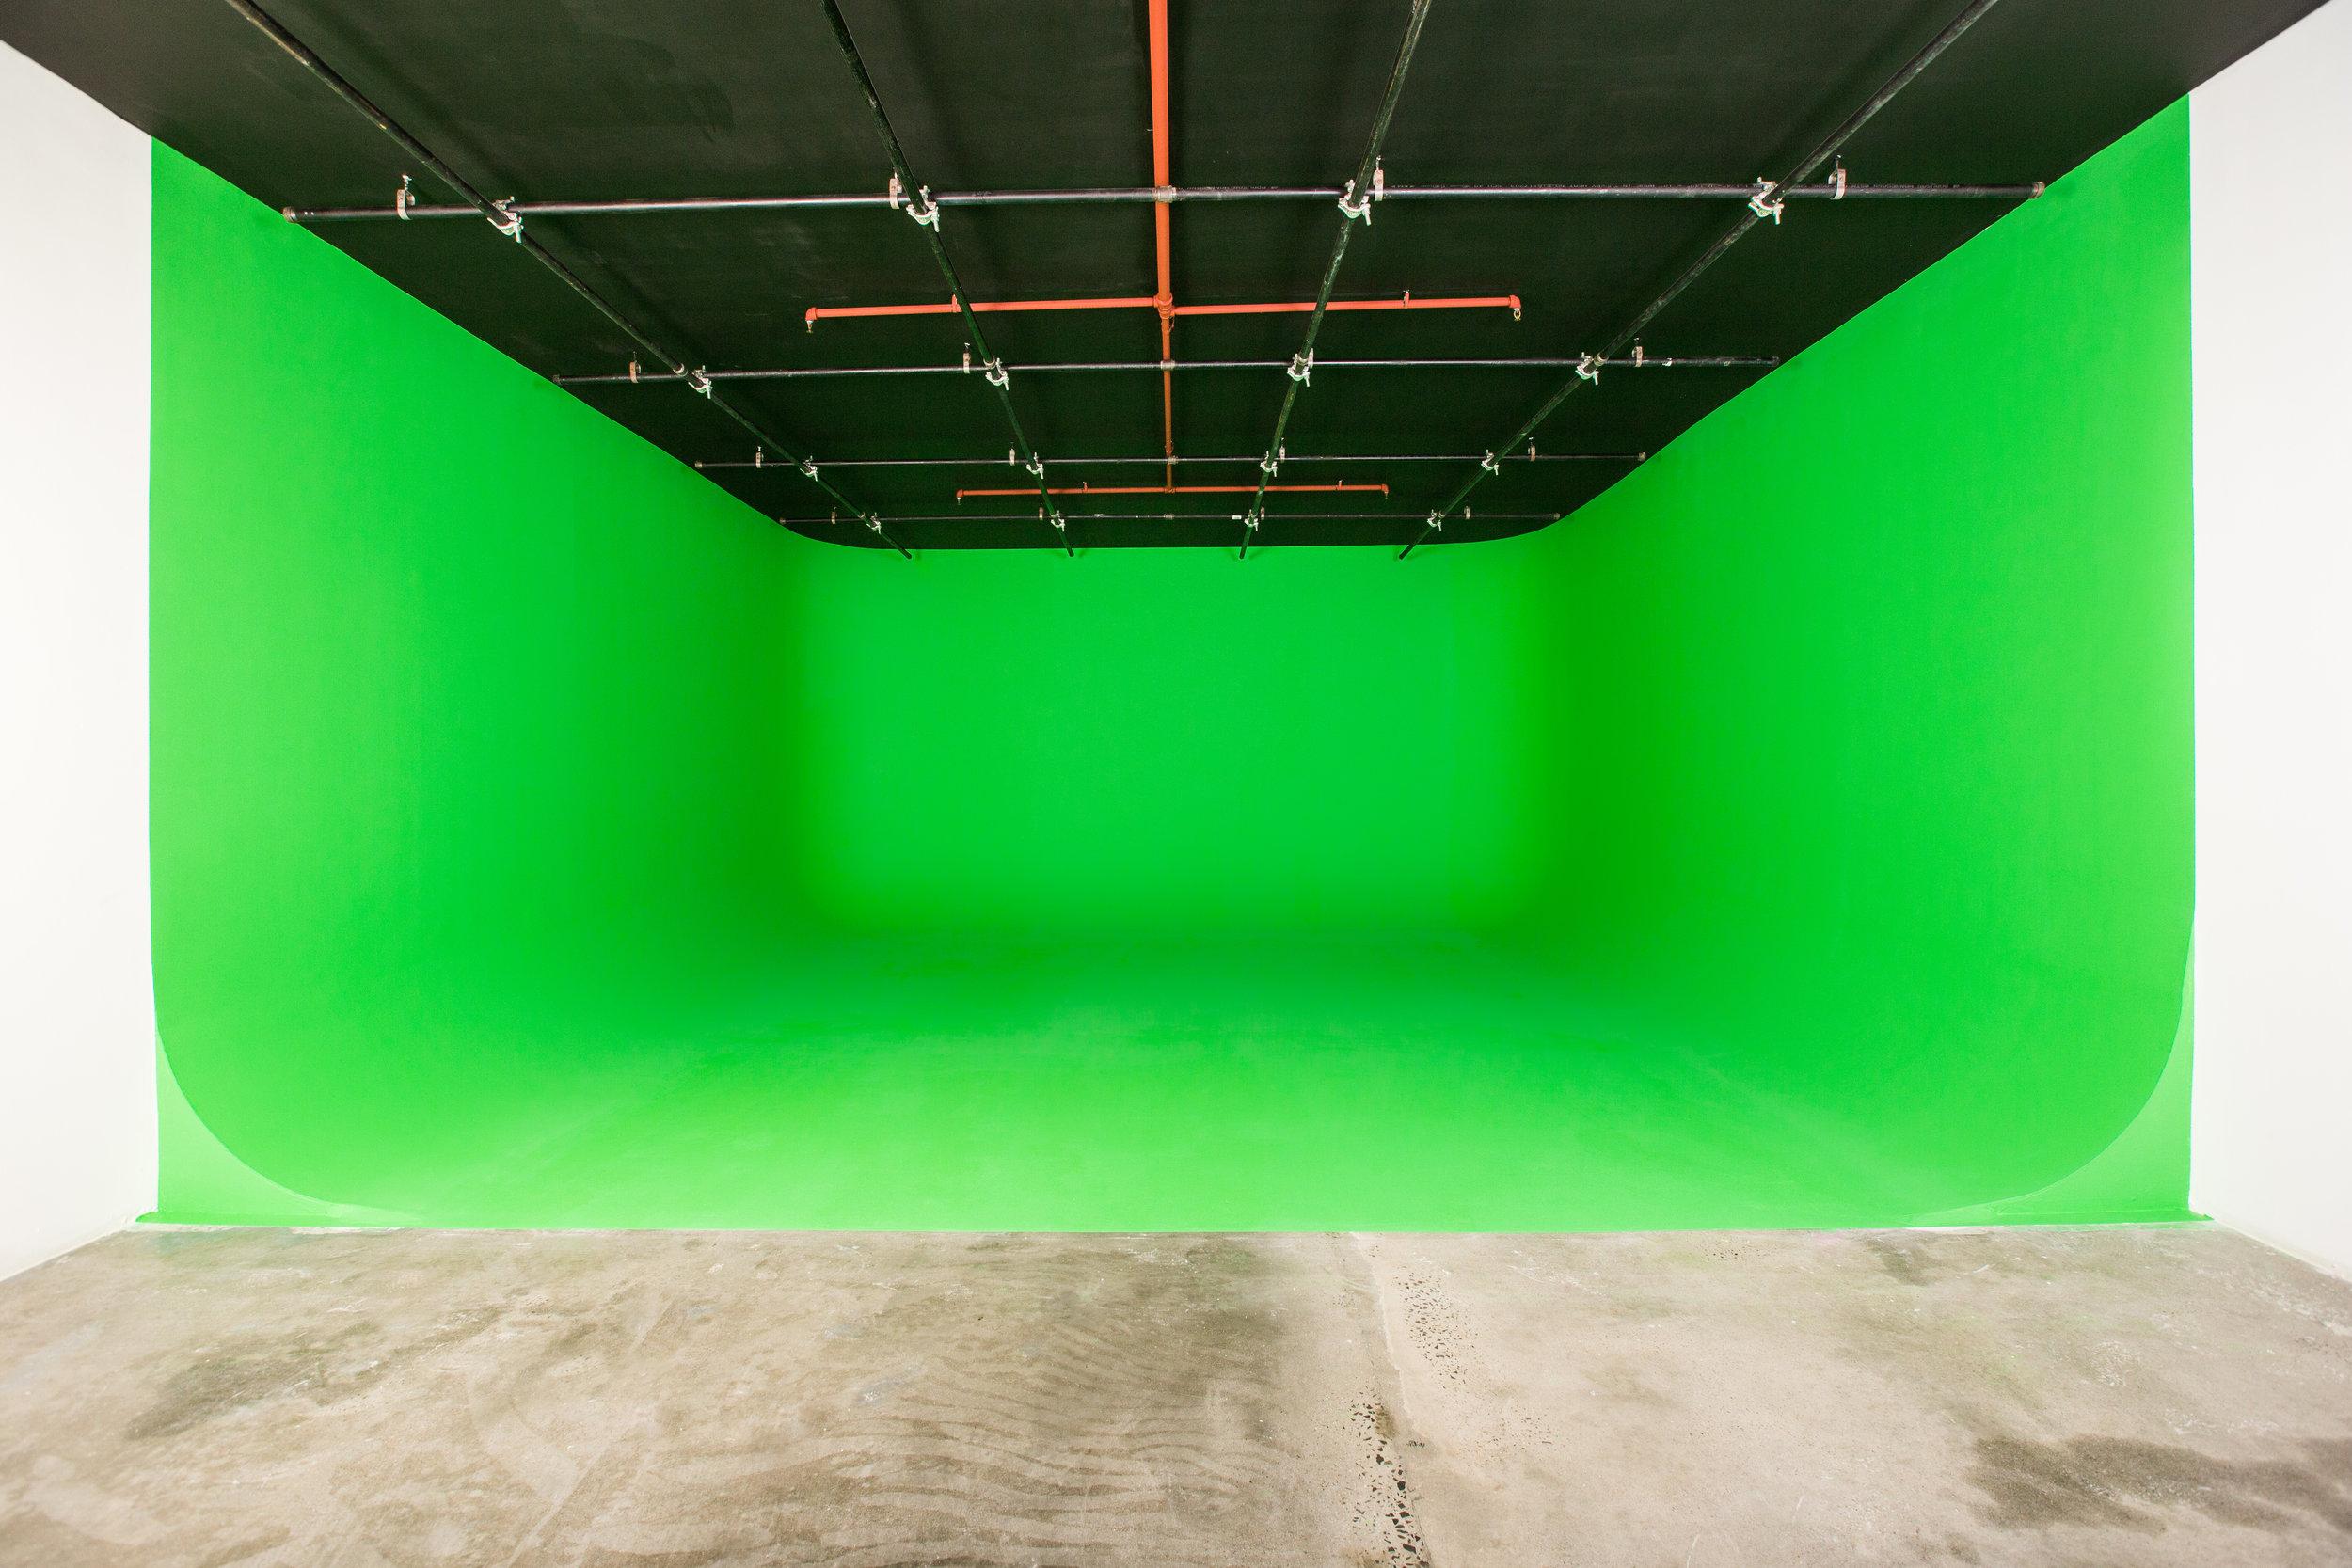 soundstage-green-screen-cyc-nyc-9.jpg